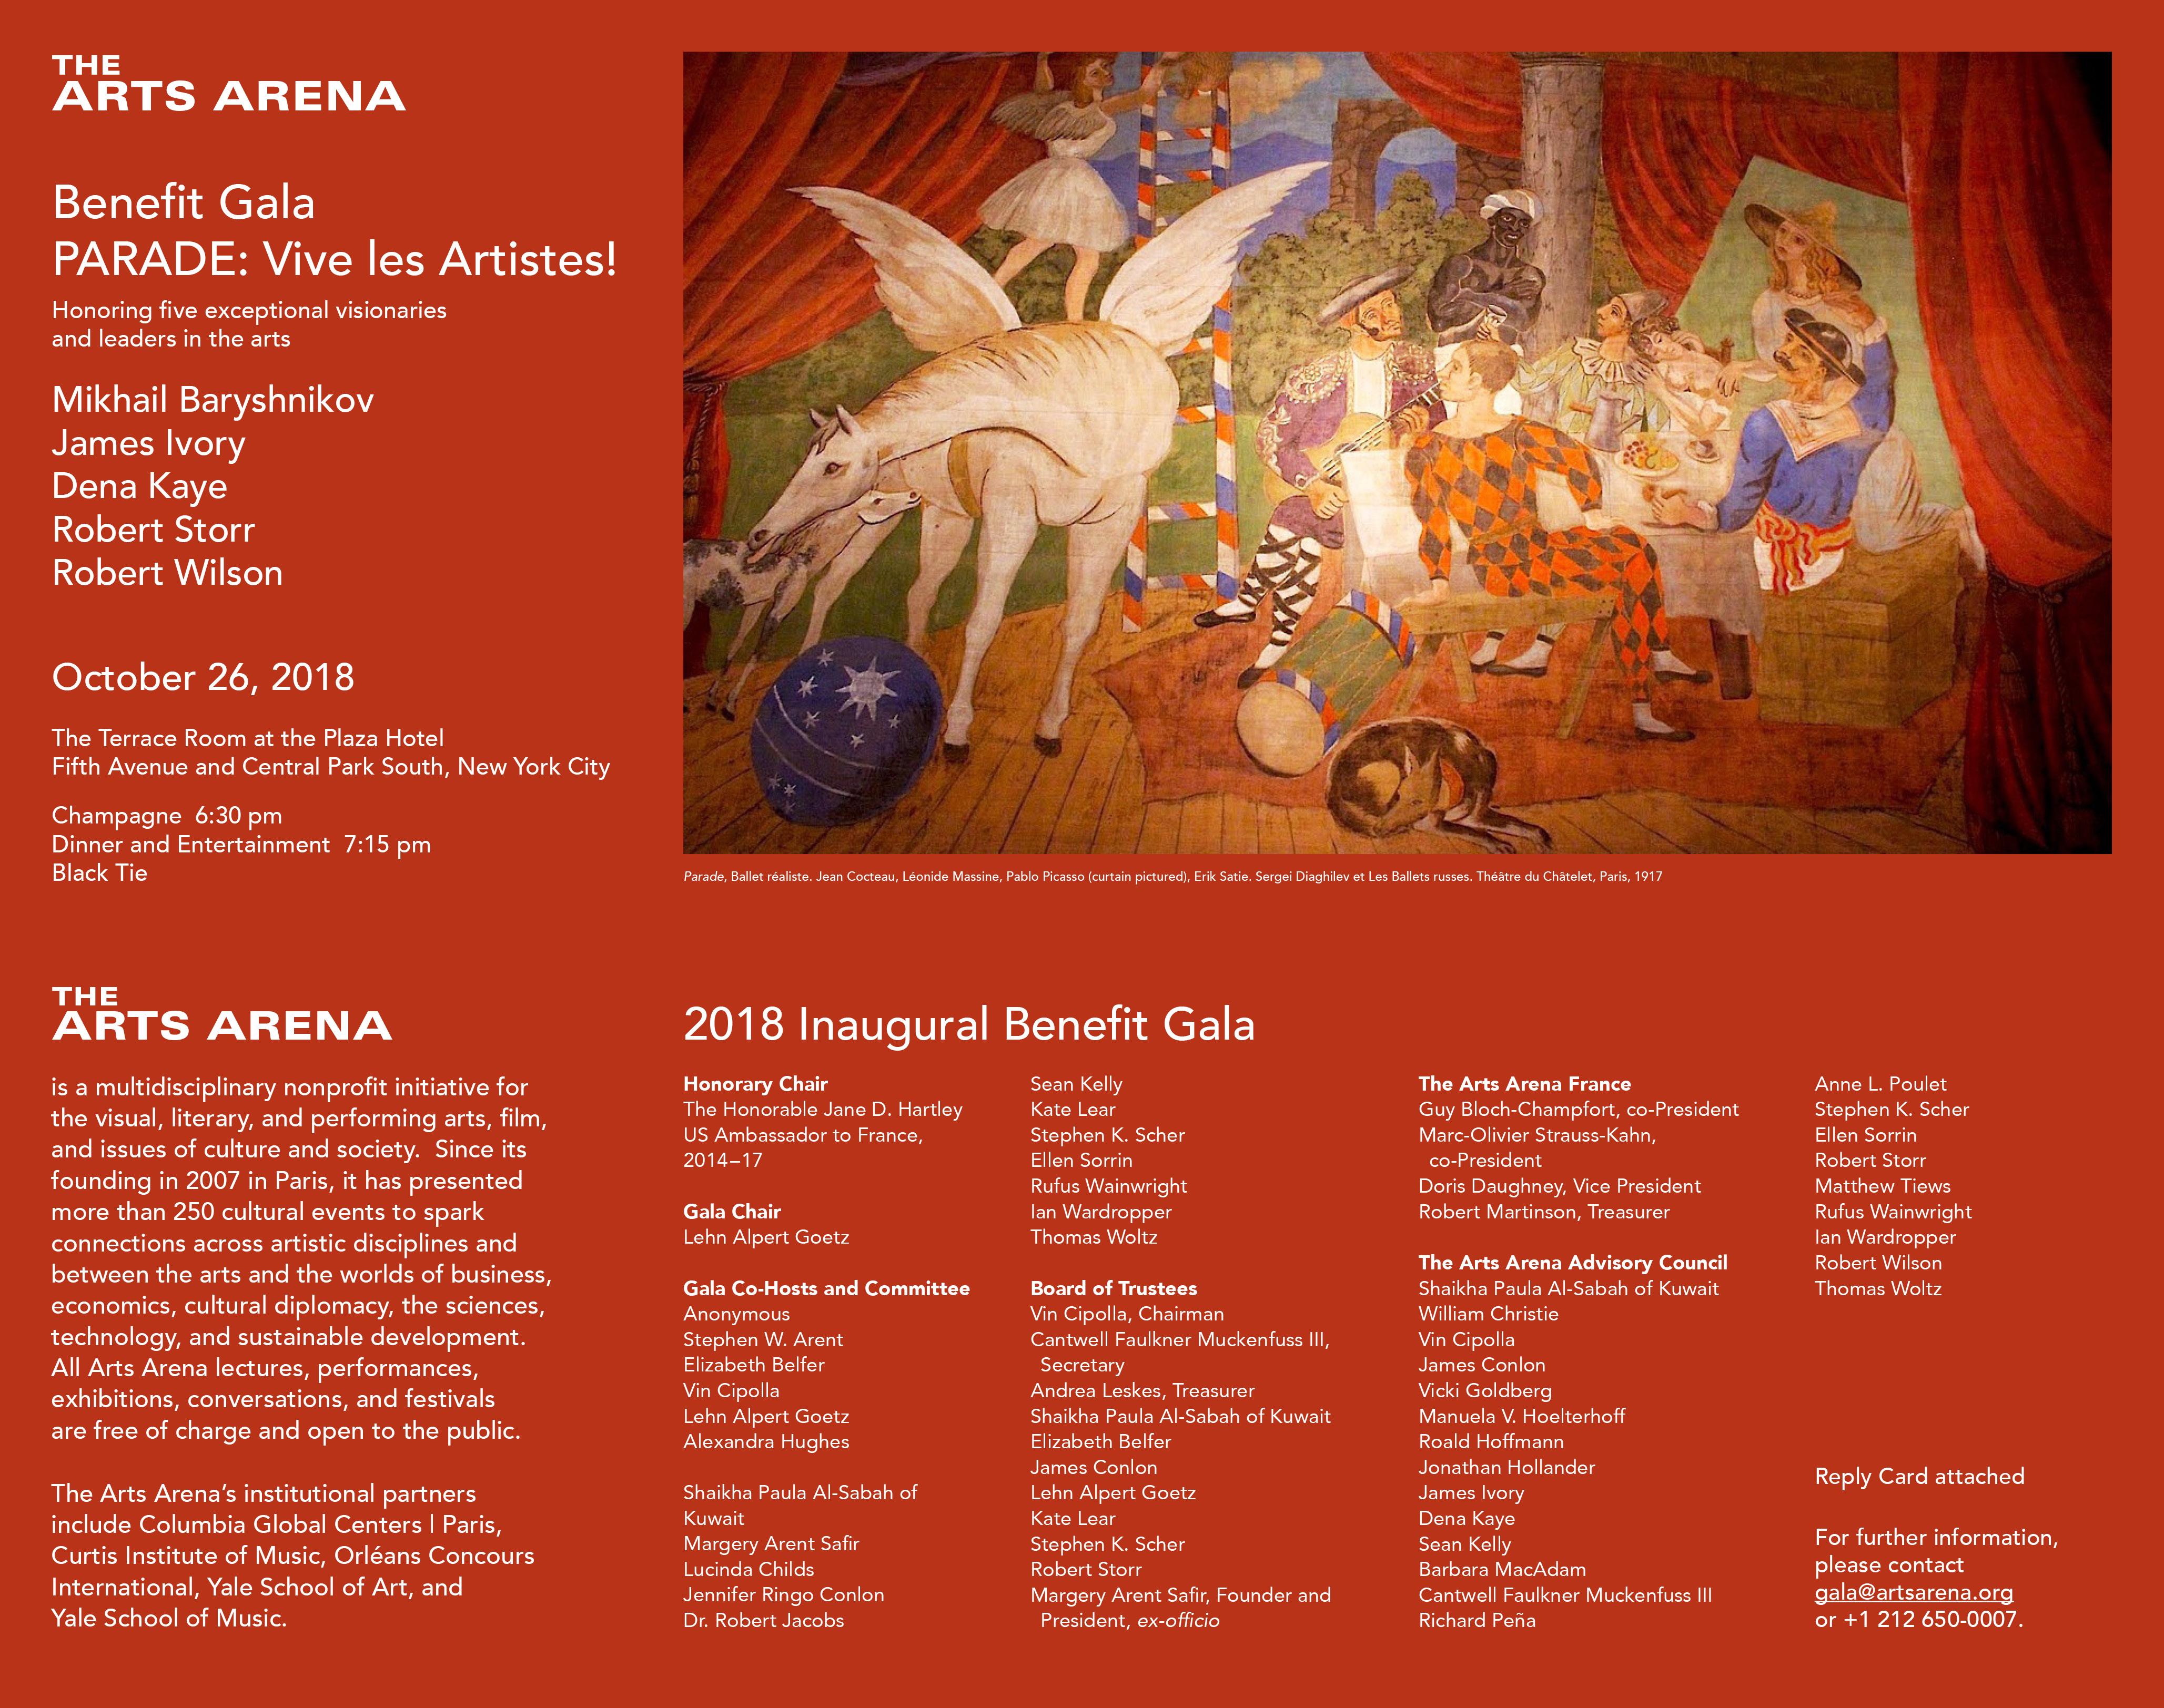 The Arts Arena Benefit Gala